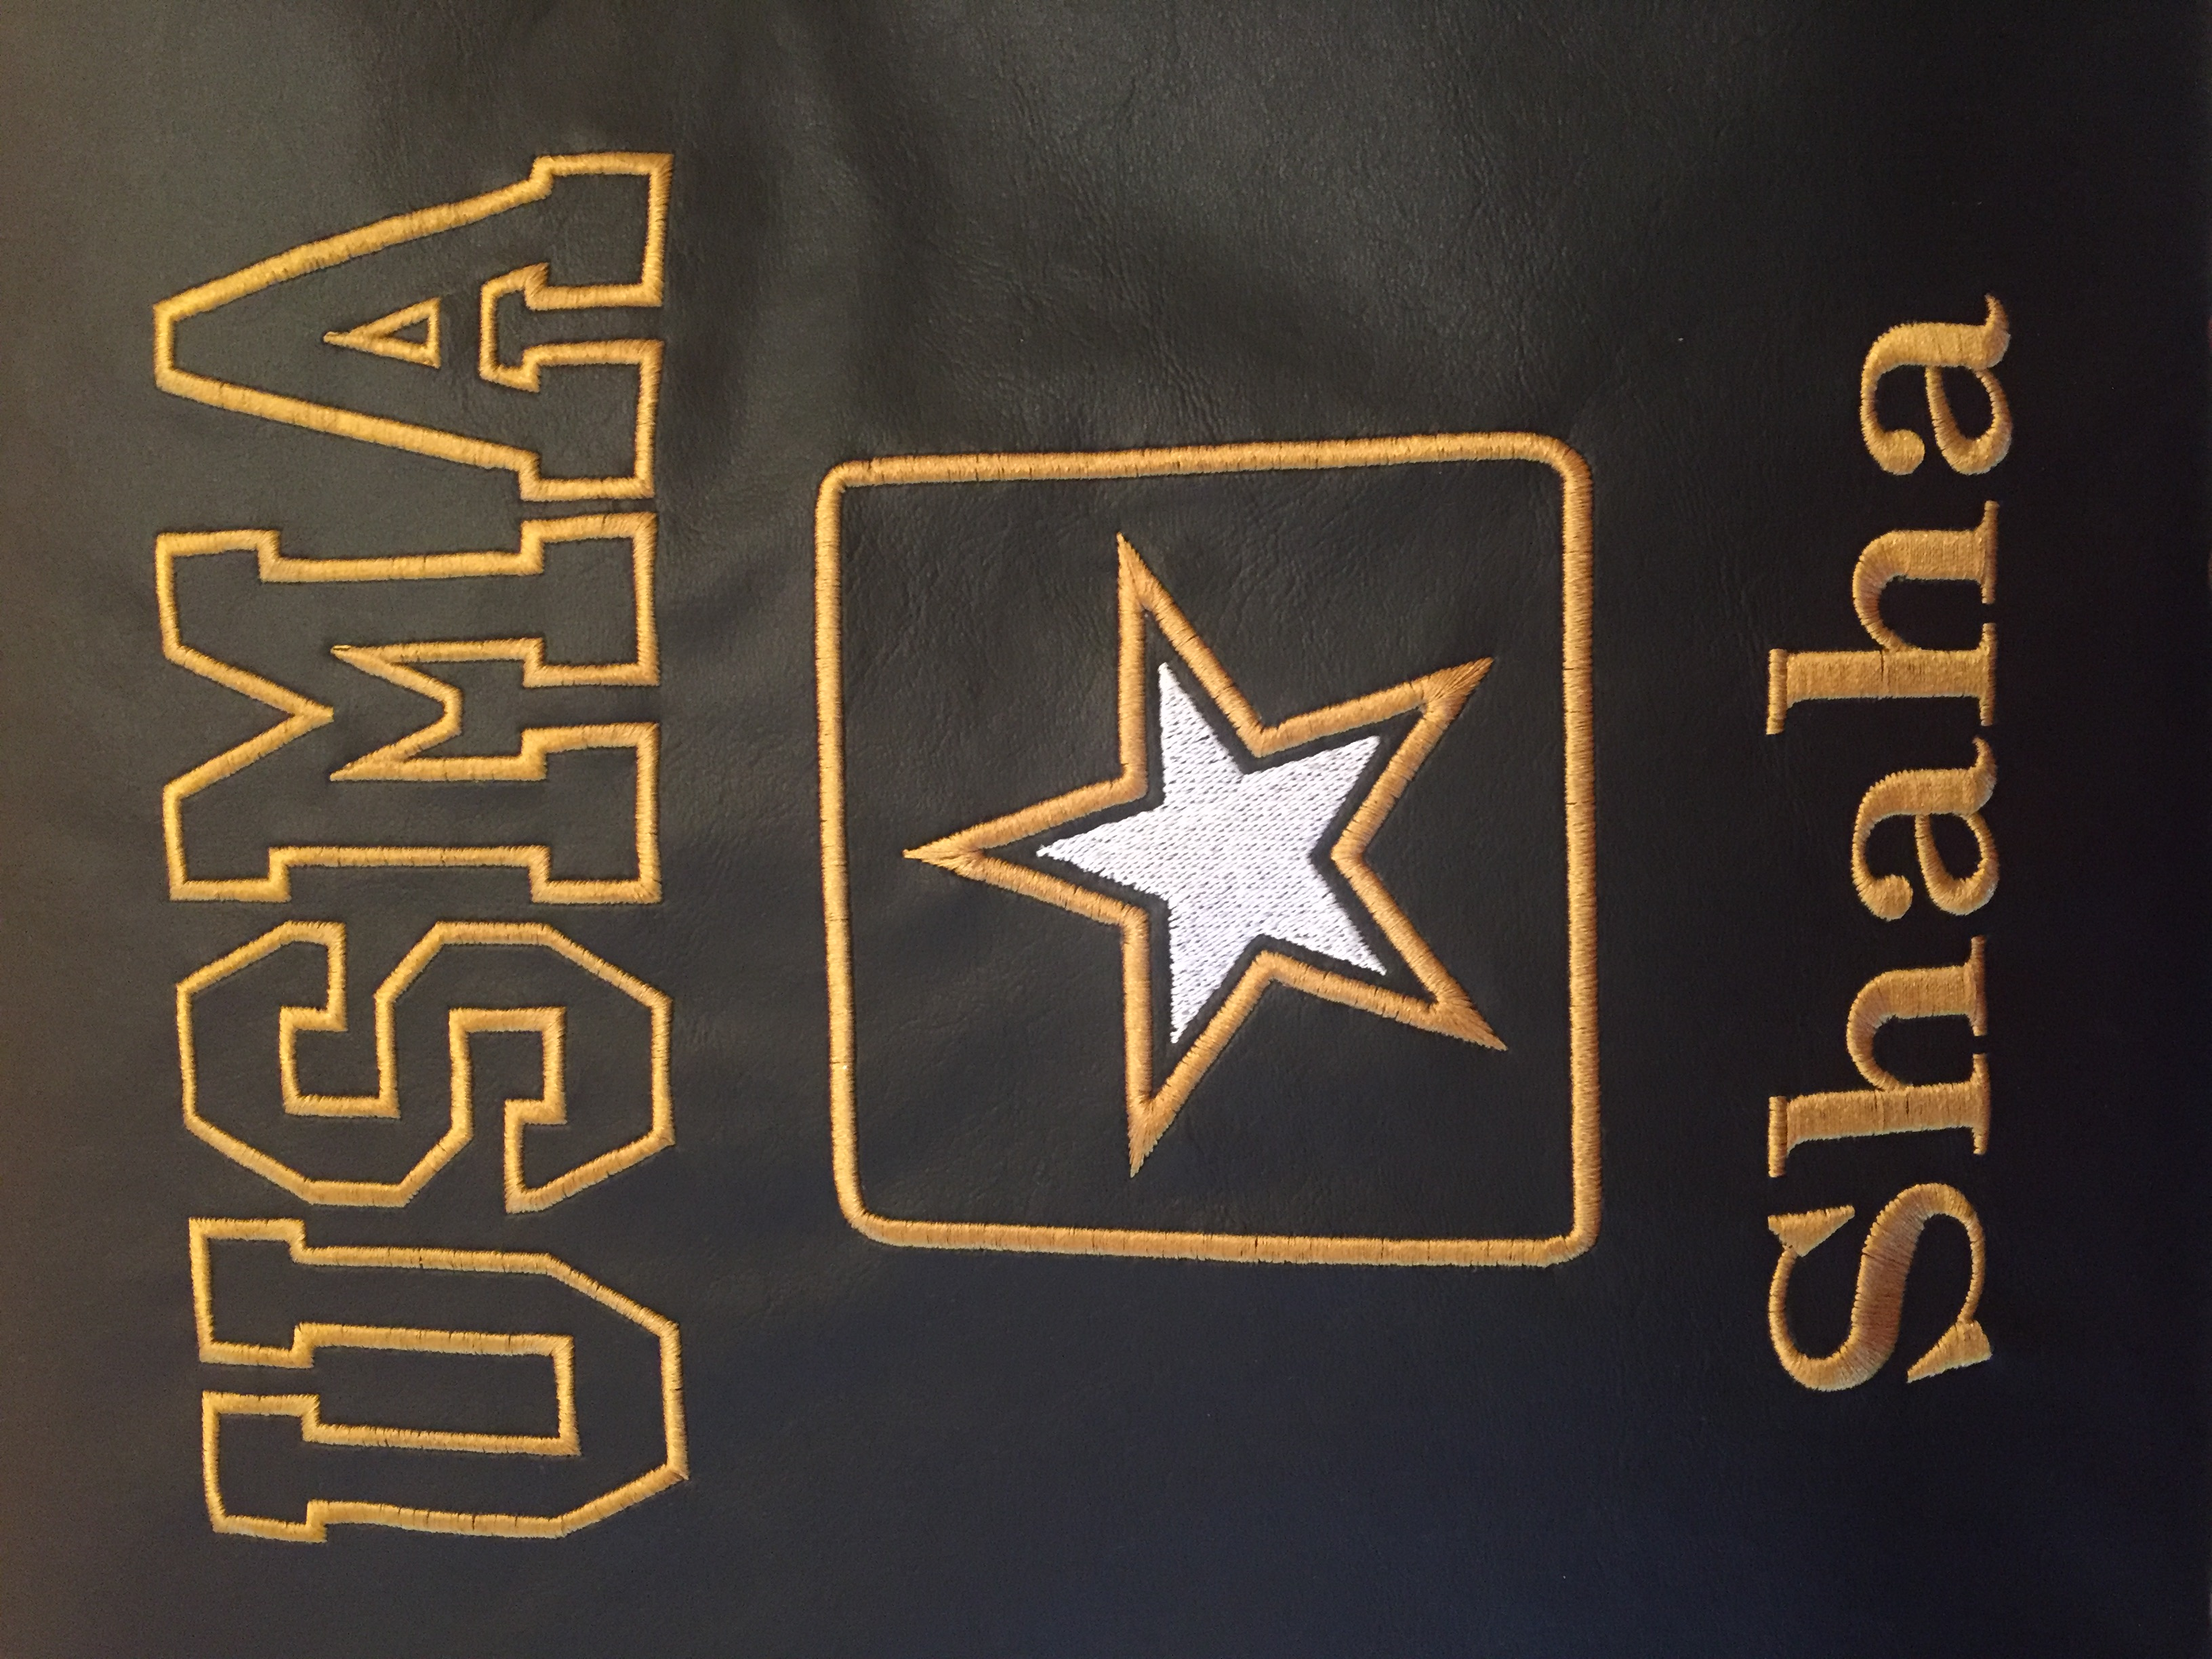 USMA Star